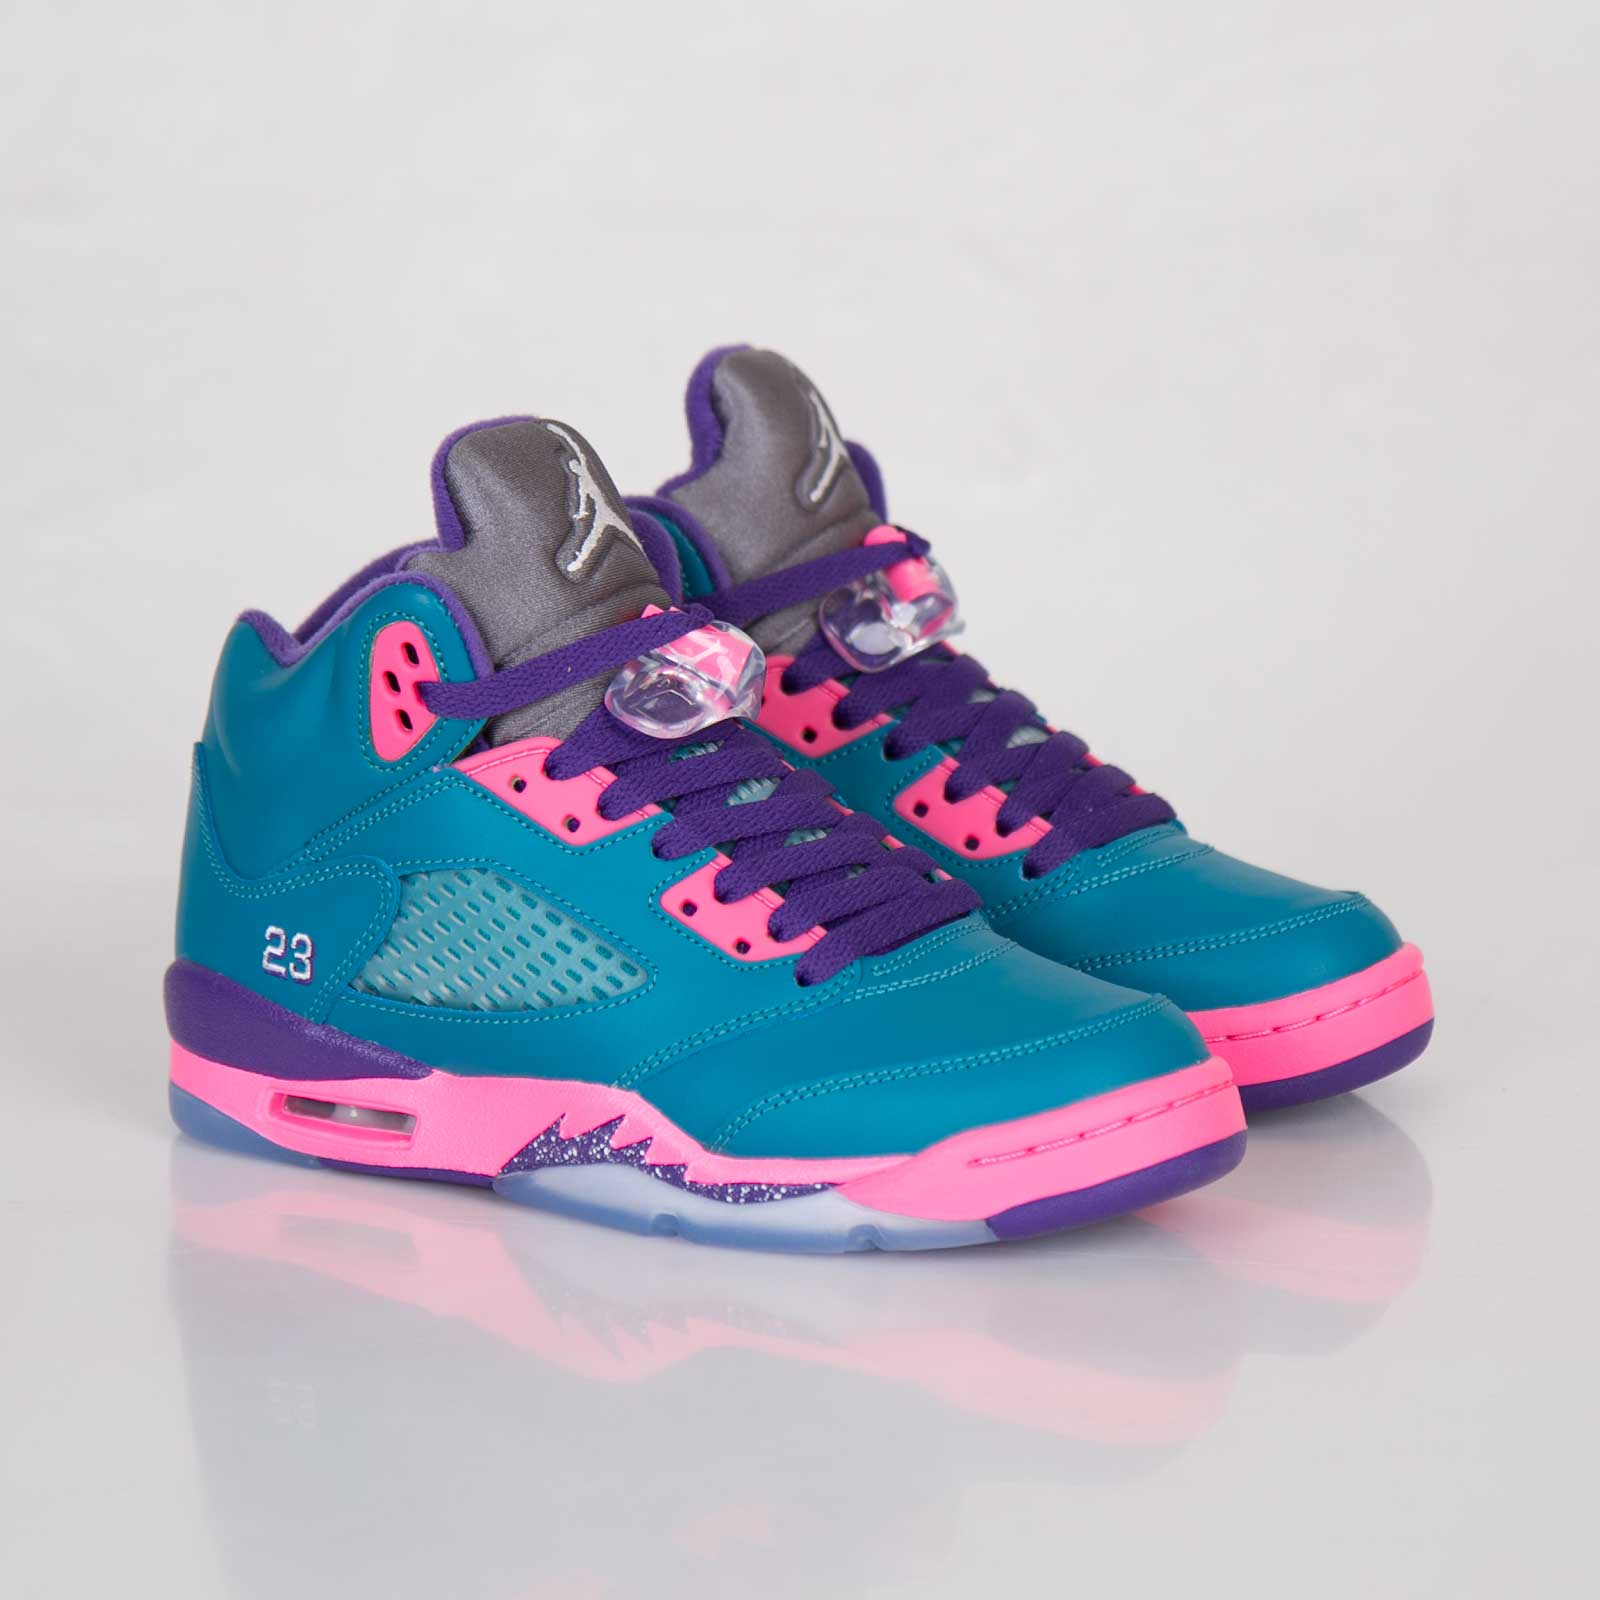 26a3b4a9ff206d Jordan Brand Girls Air Jordan 5 Retro (GS) - 440892-307 ...